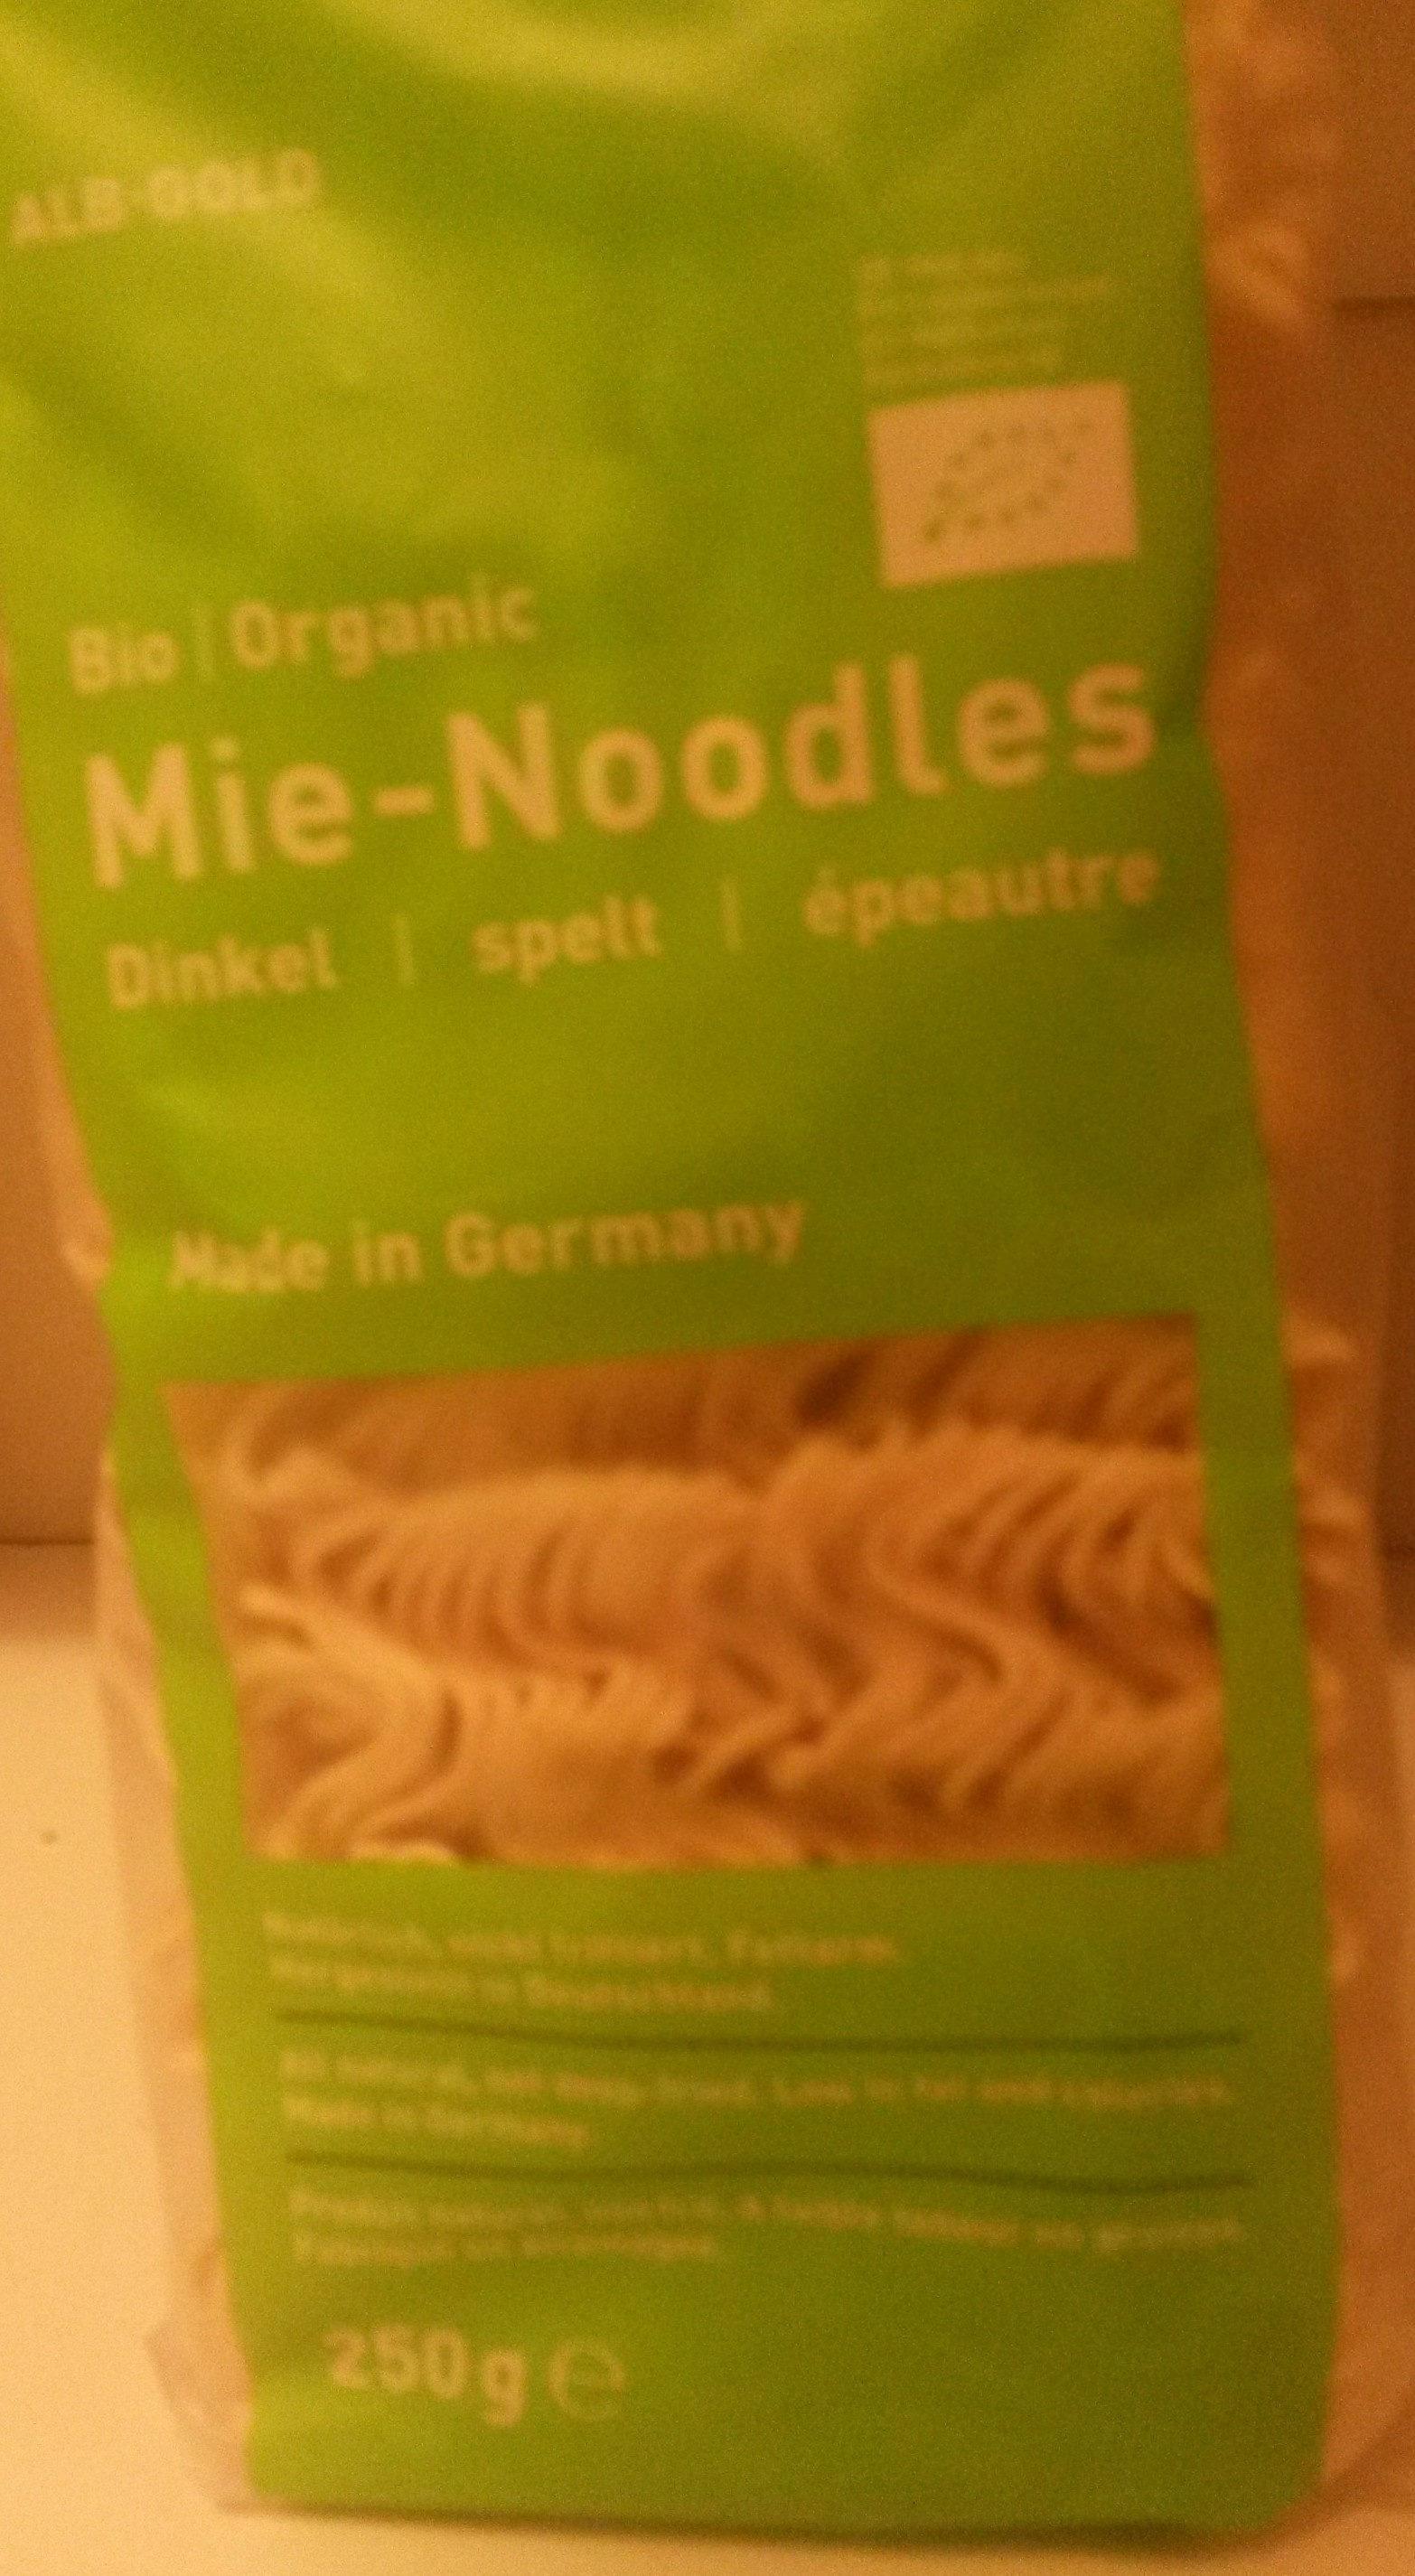 Alb-natur Teigwaren Dinkel Mie-noodle, 250 GR Packung - Produit - fr